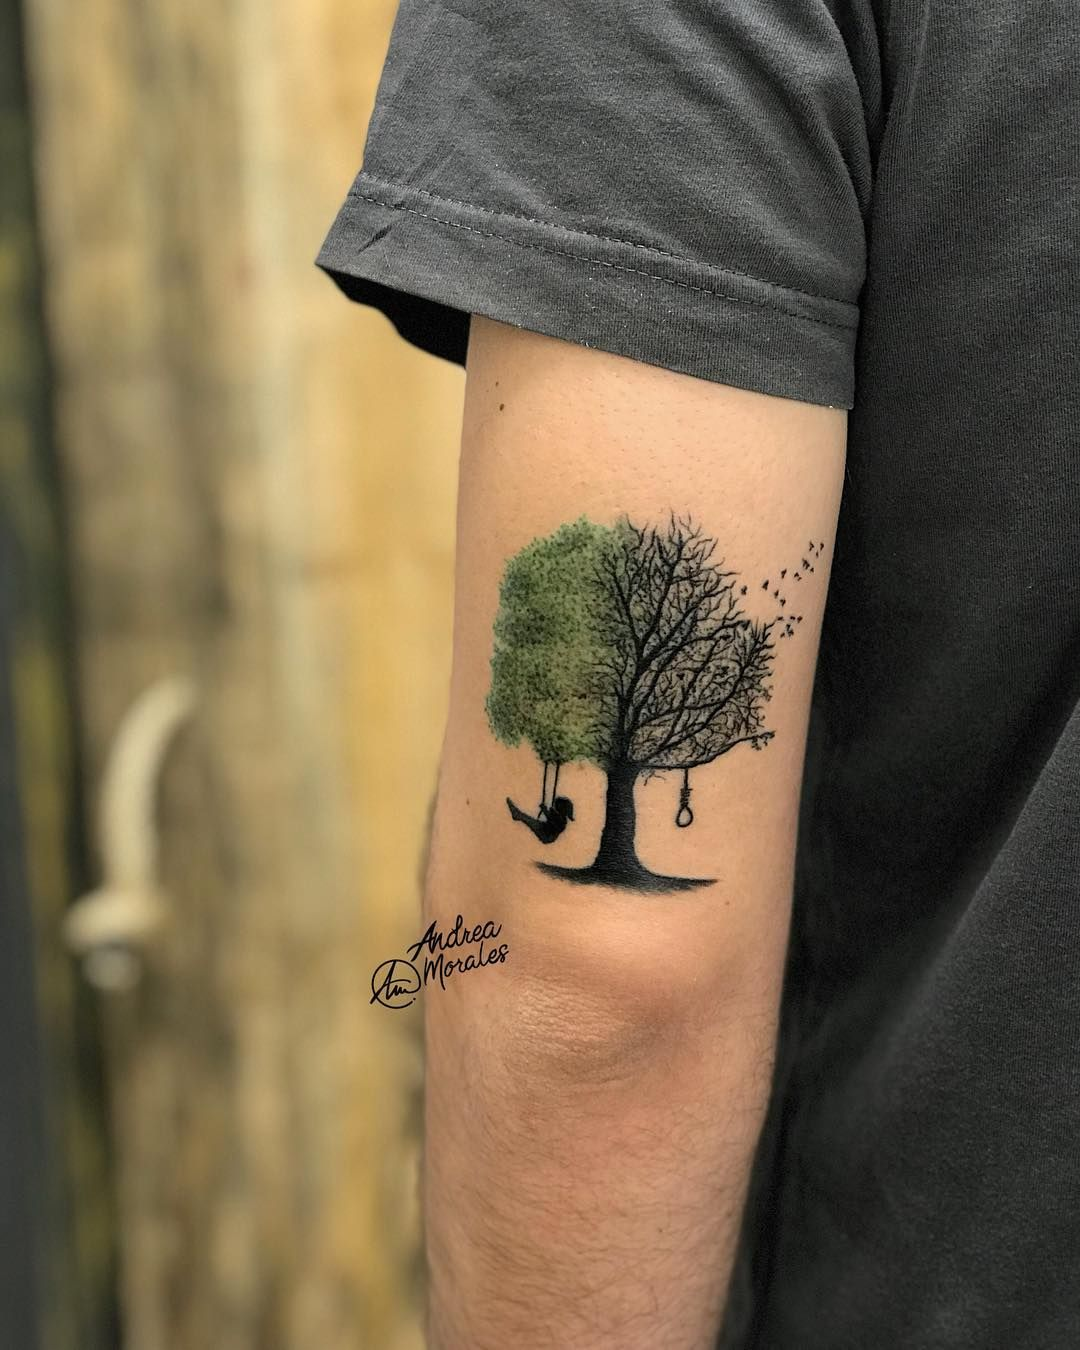 Tattoo Art By Andrea Morales Tattoo Pinterest Tatouages Idees